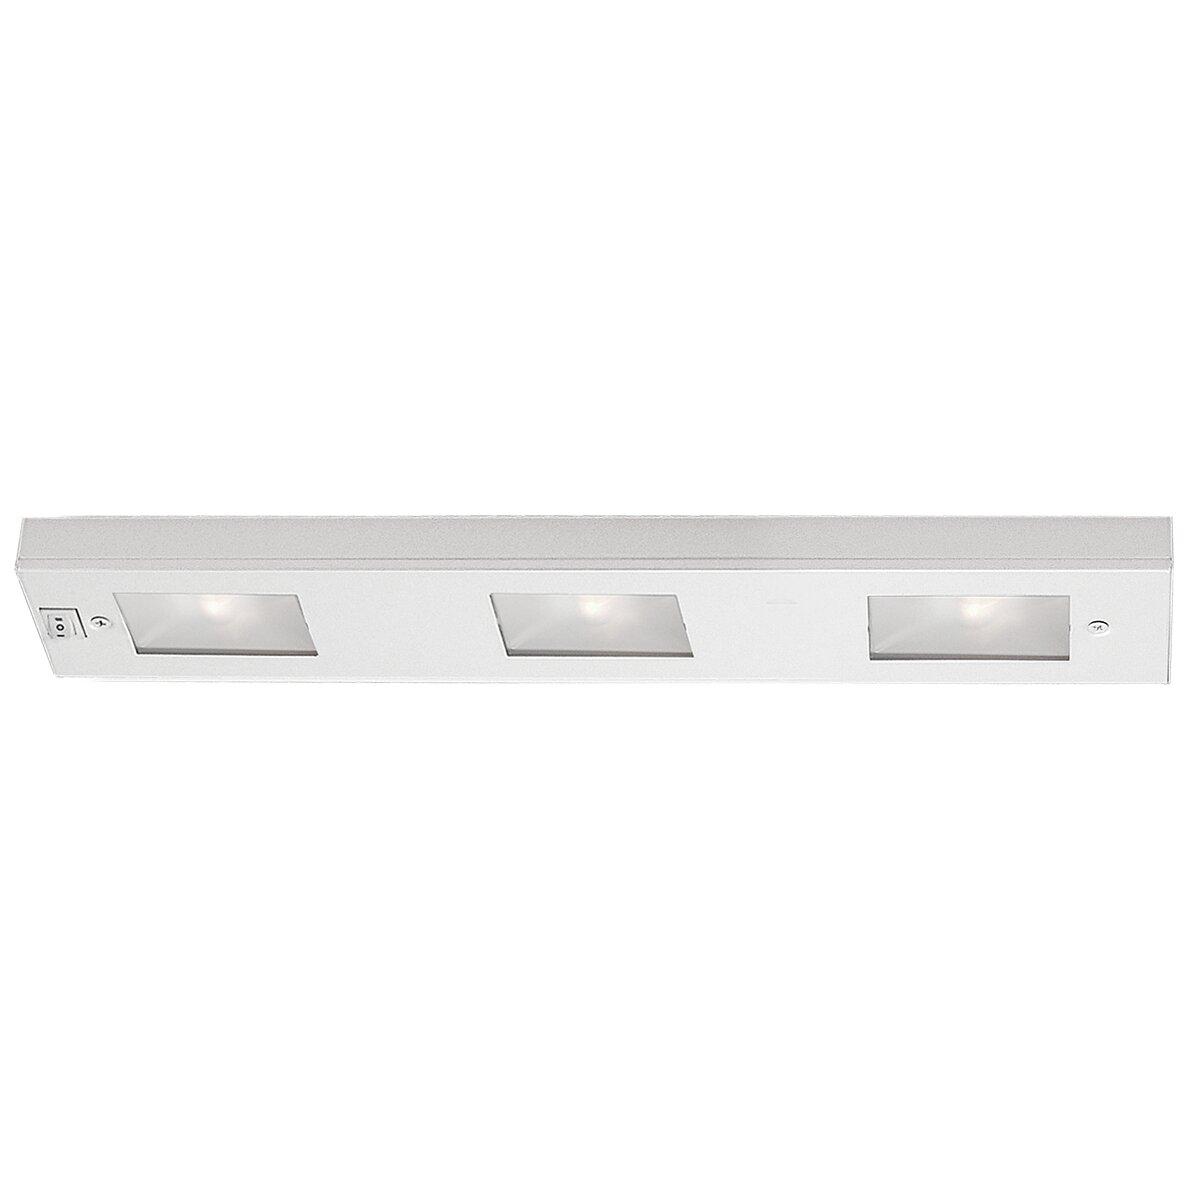 Wac Lighting 17 875 Quot Xenon Under Cabinet Bar Light